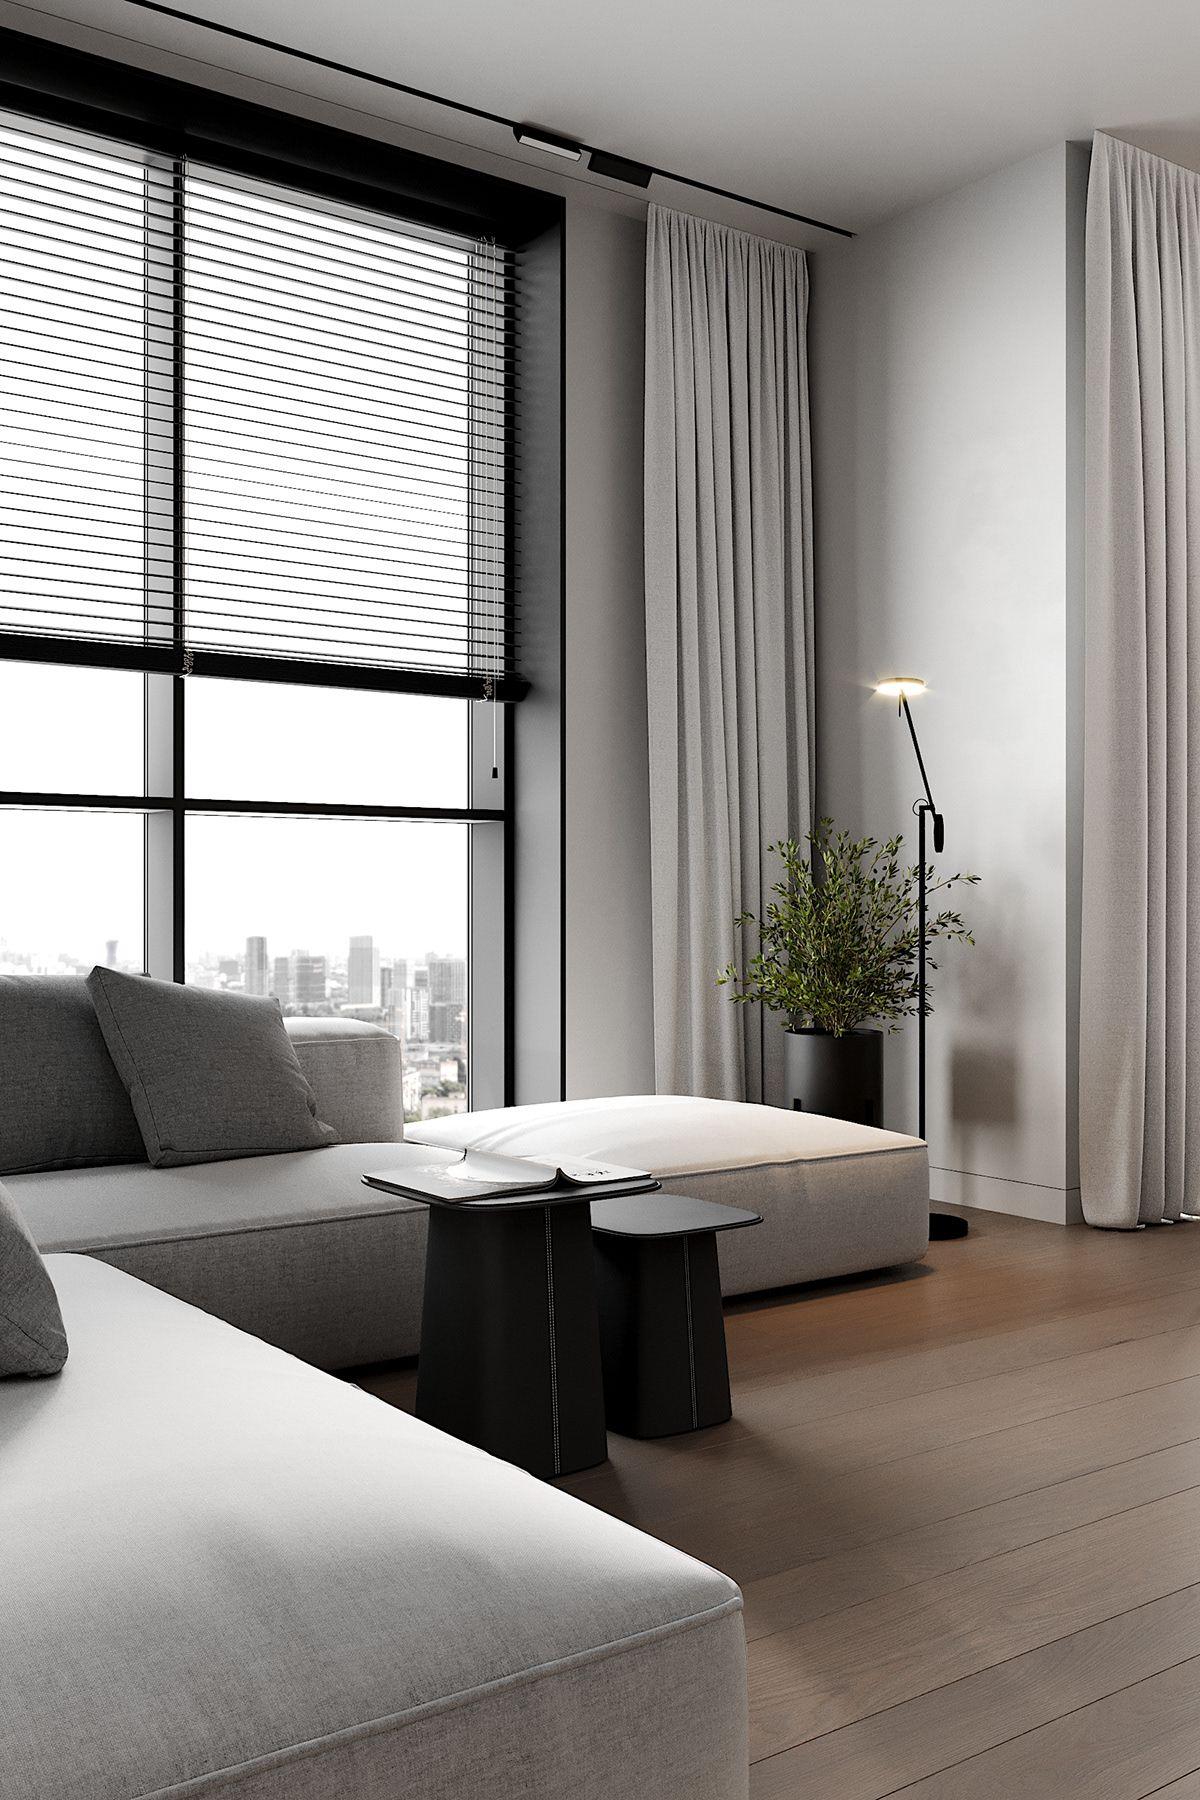 Autodesk Room Design: General Spaces On Behance